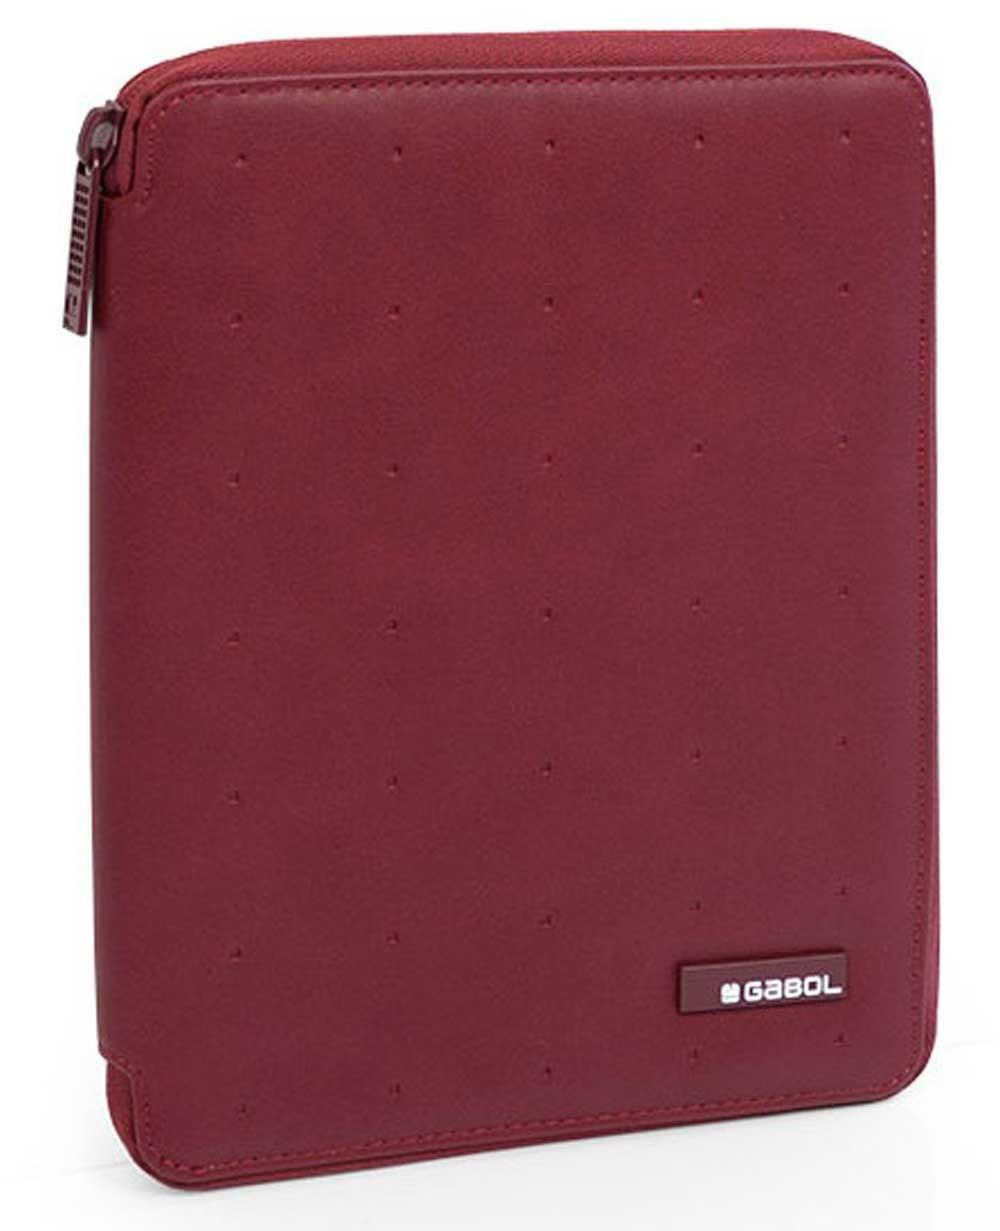 "Gabol Alpha 8"" Portafolio A5 tablet Rojo (Foto )"